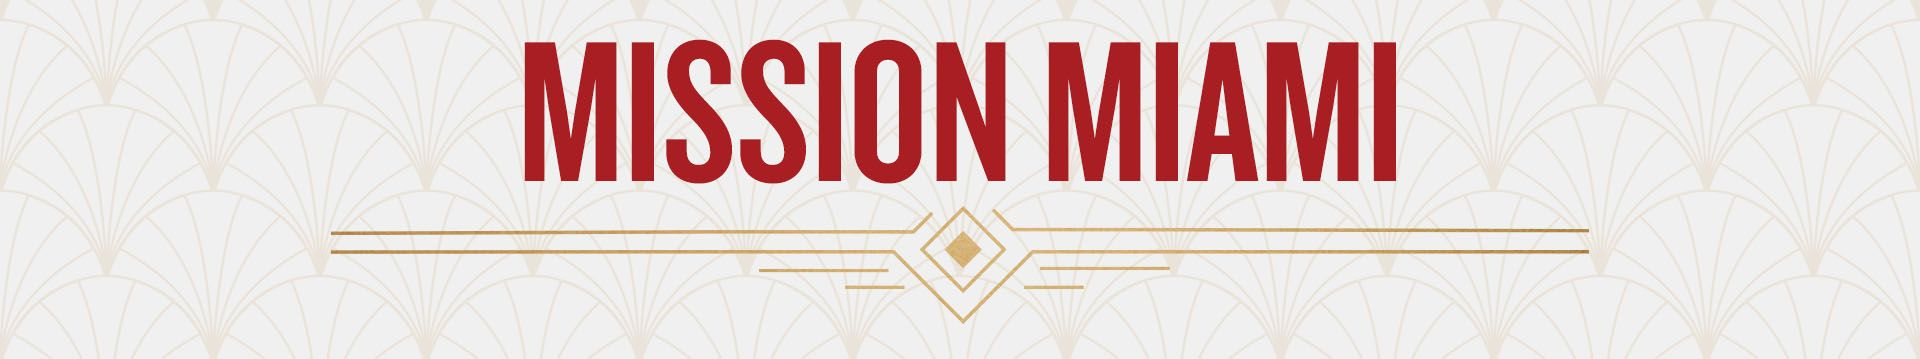 SuperBowl-Webpage-Mission Miami